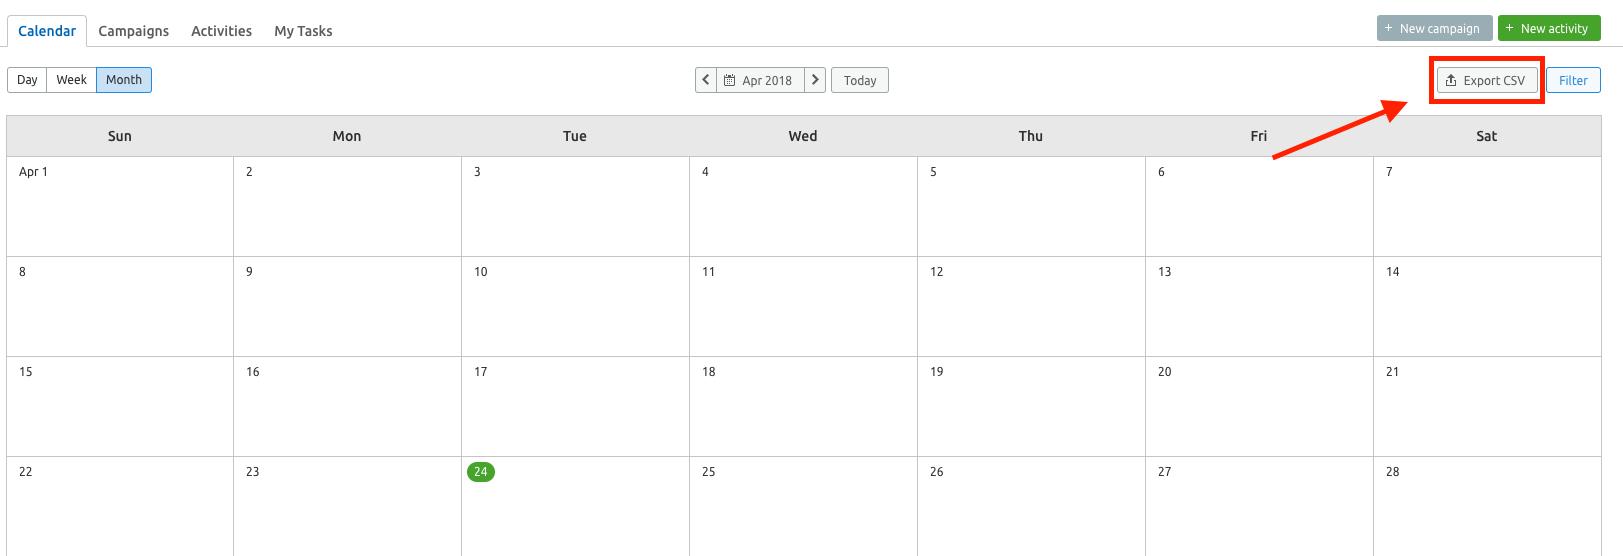 Marketing Calendar image 10